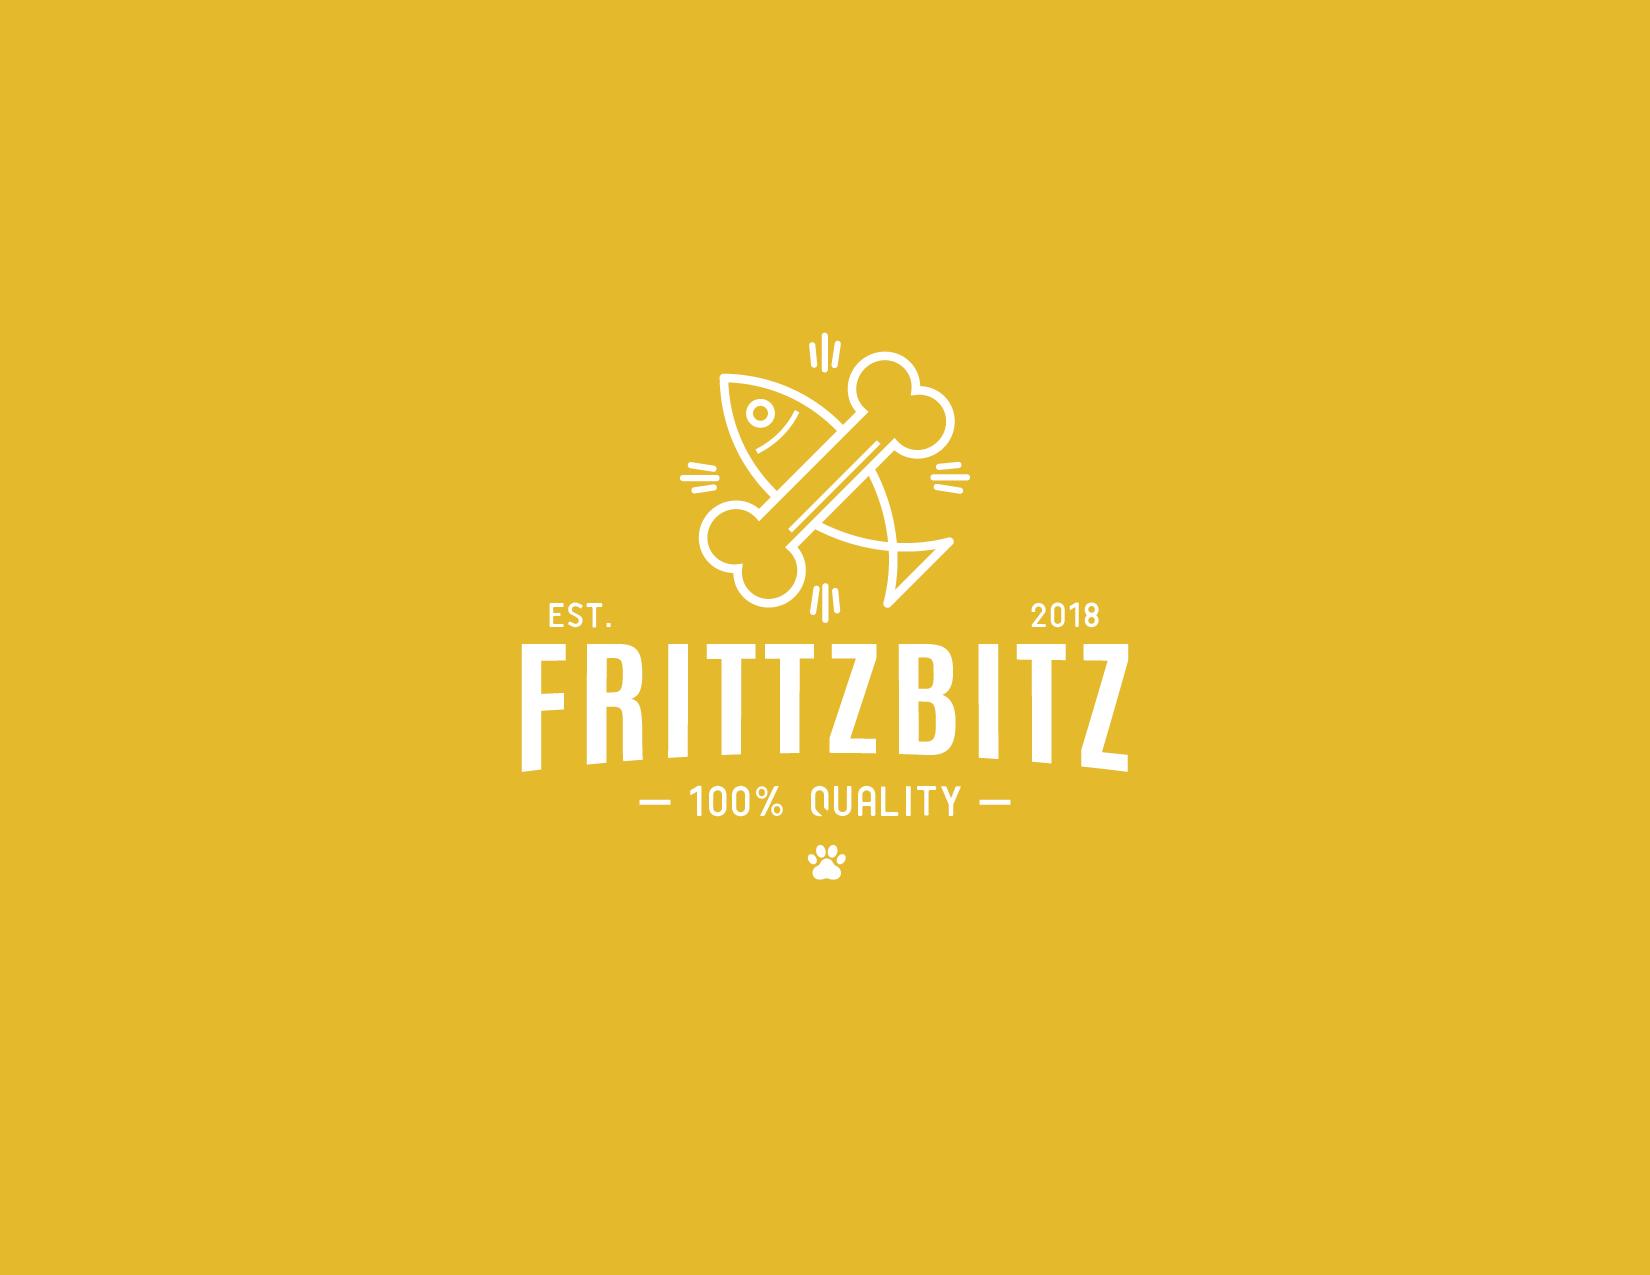 Frittzbittz Logo yellow-01.png